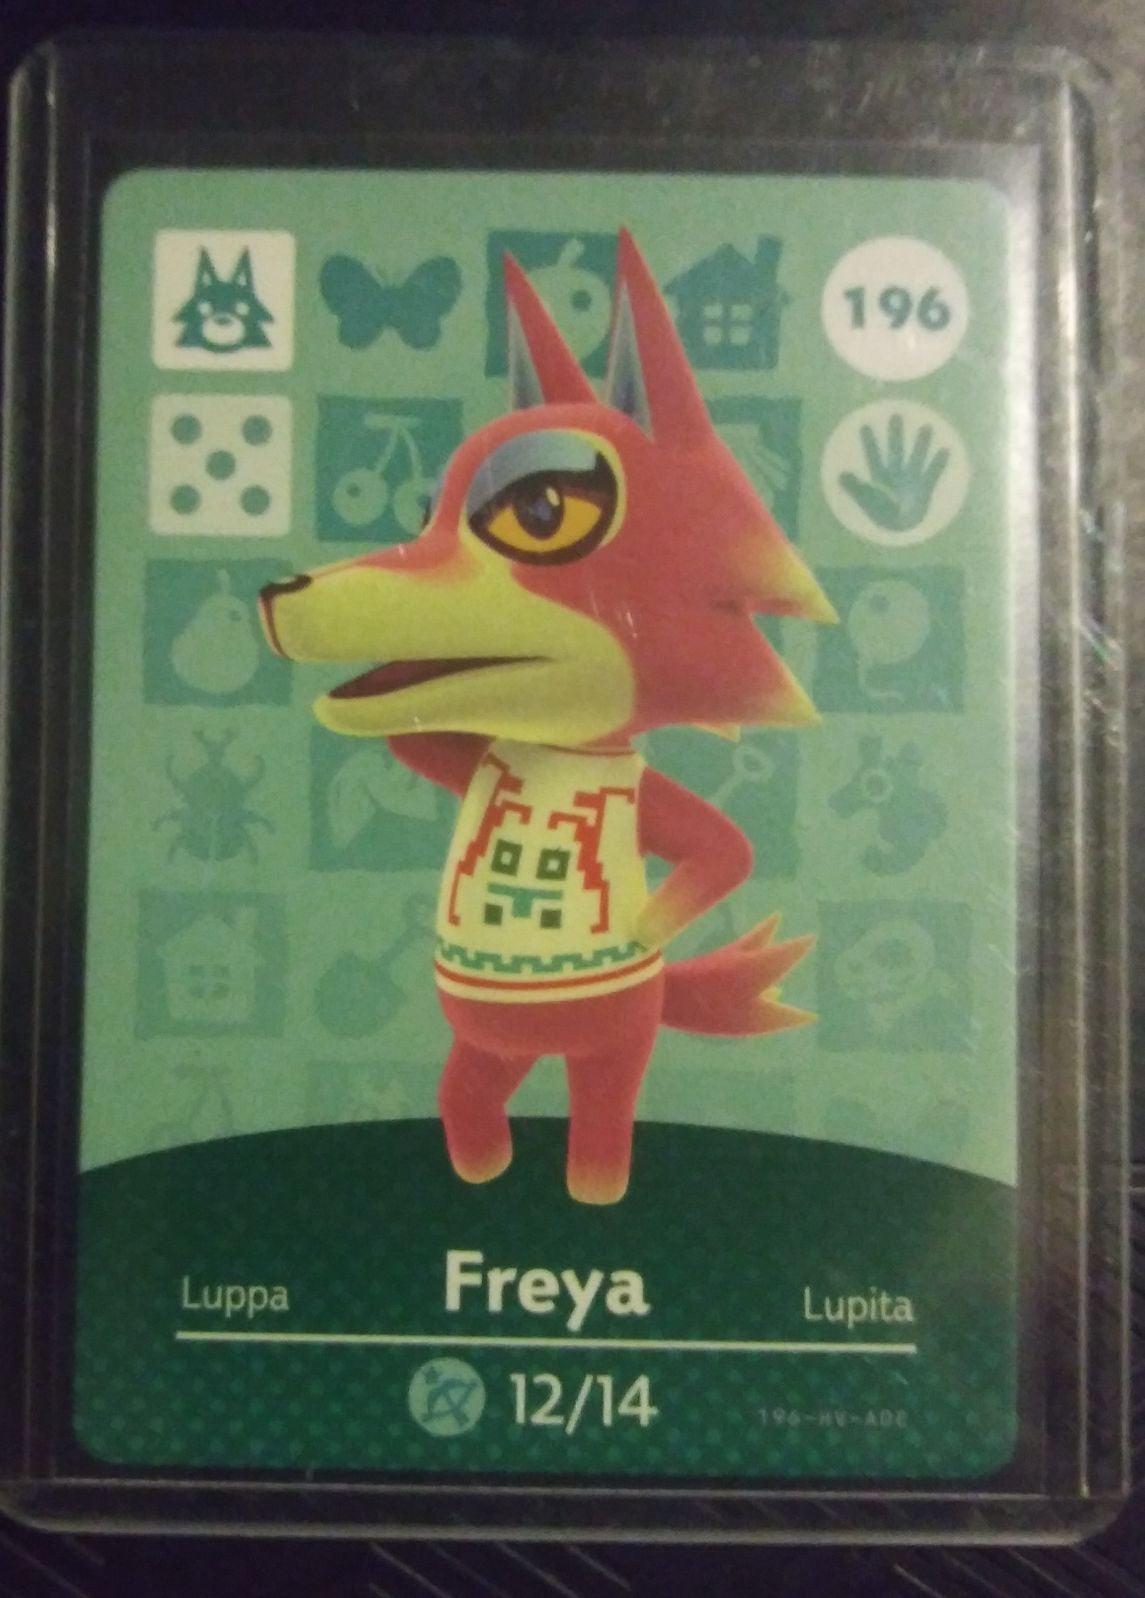 Animal Crossing Freya 196 Amiibo Card